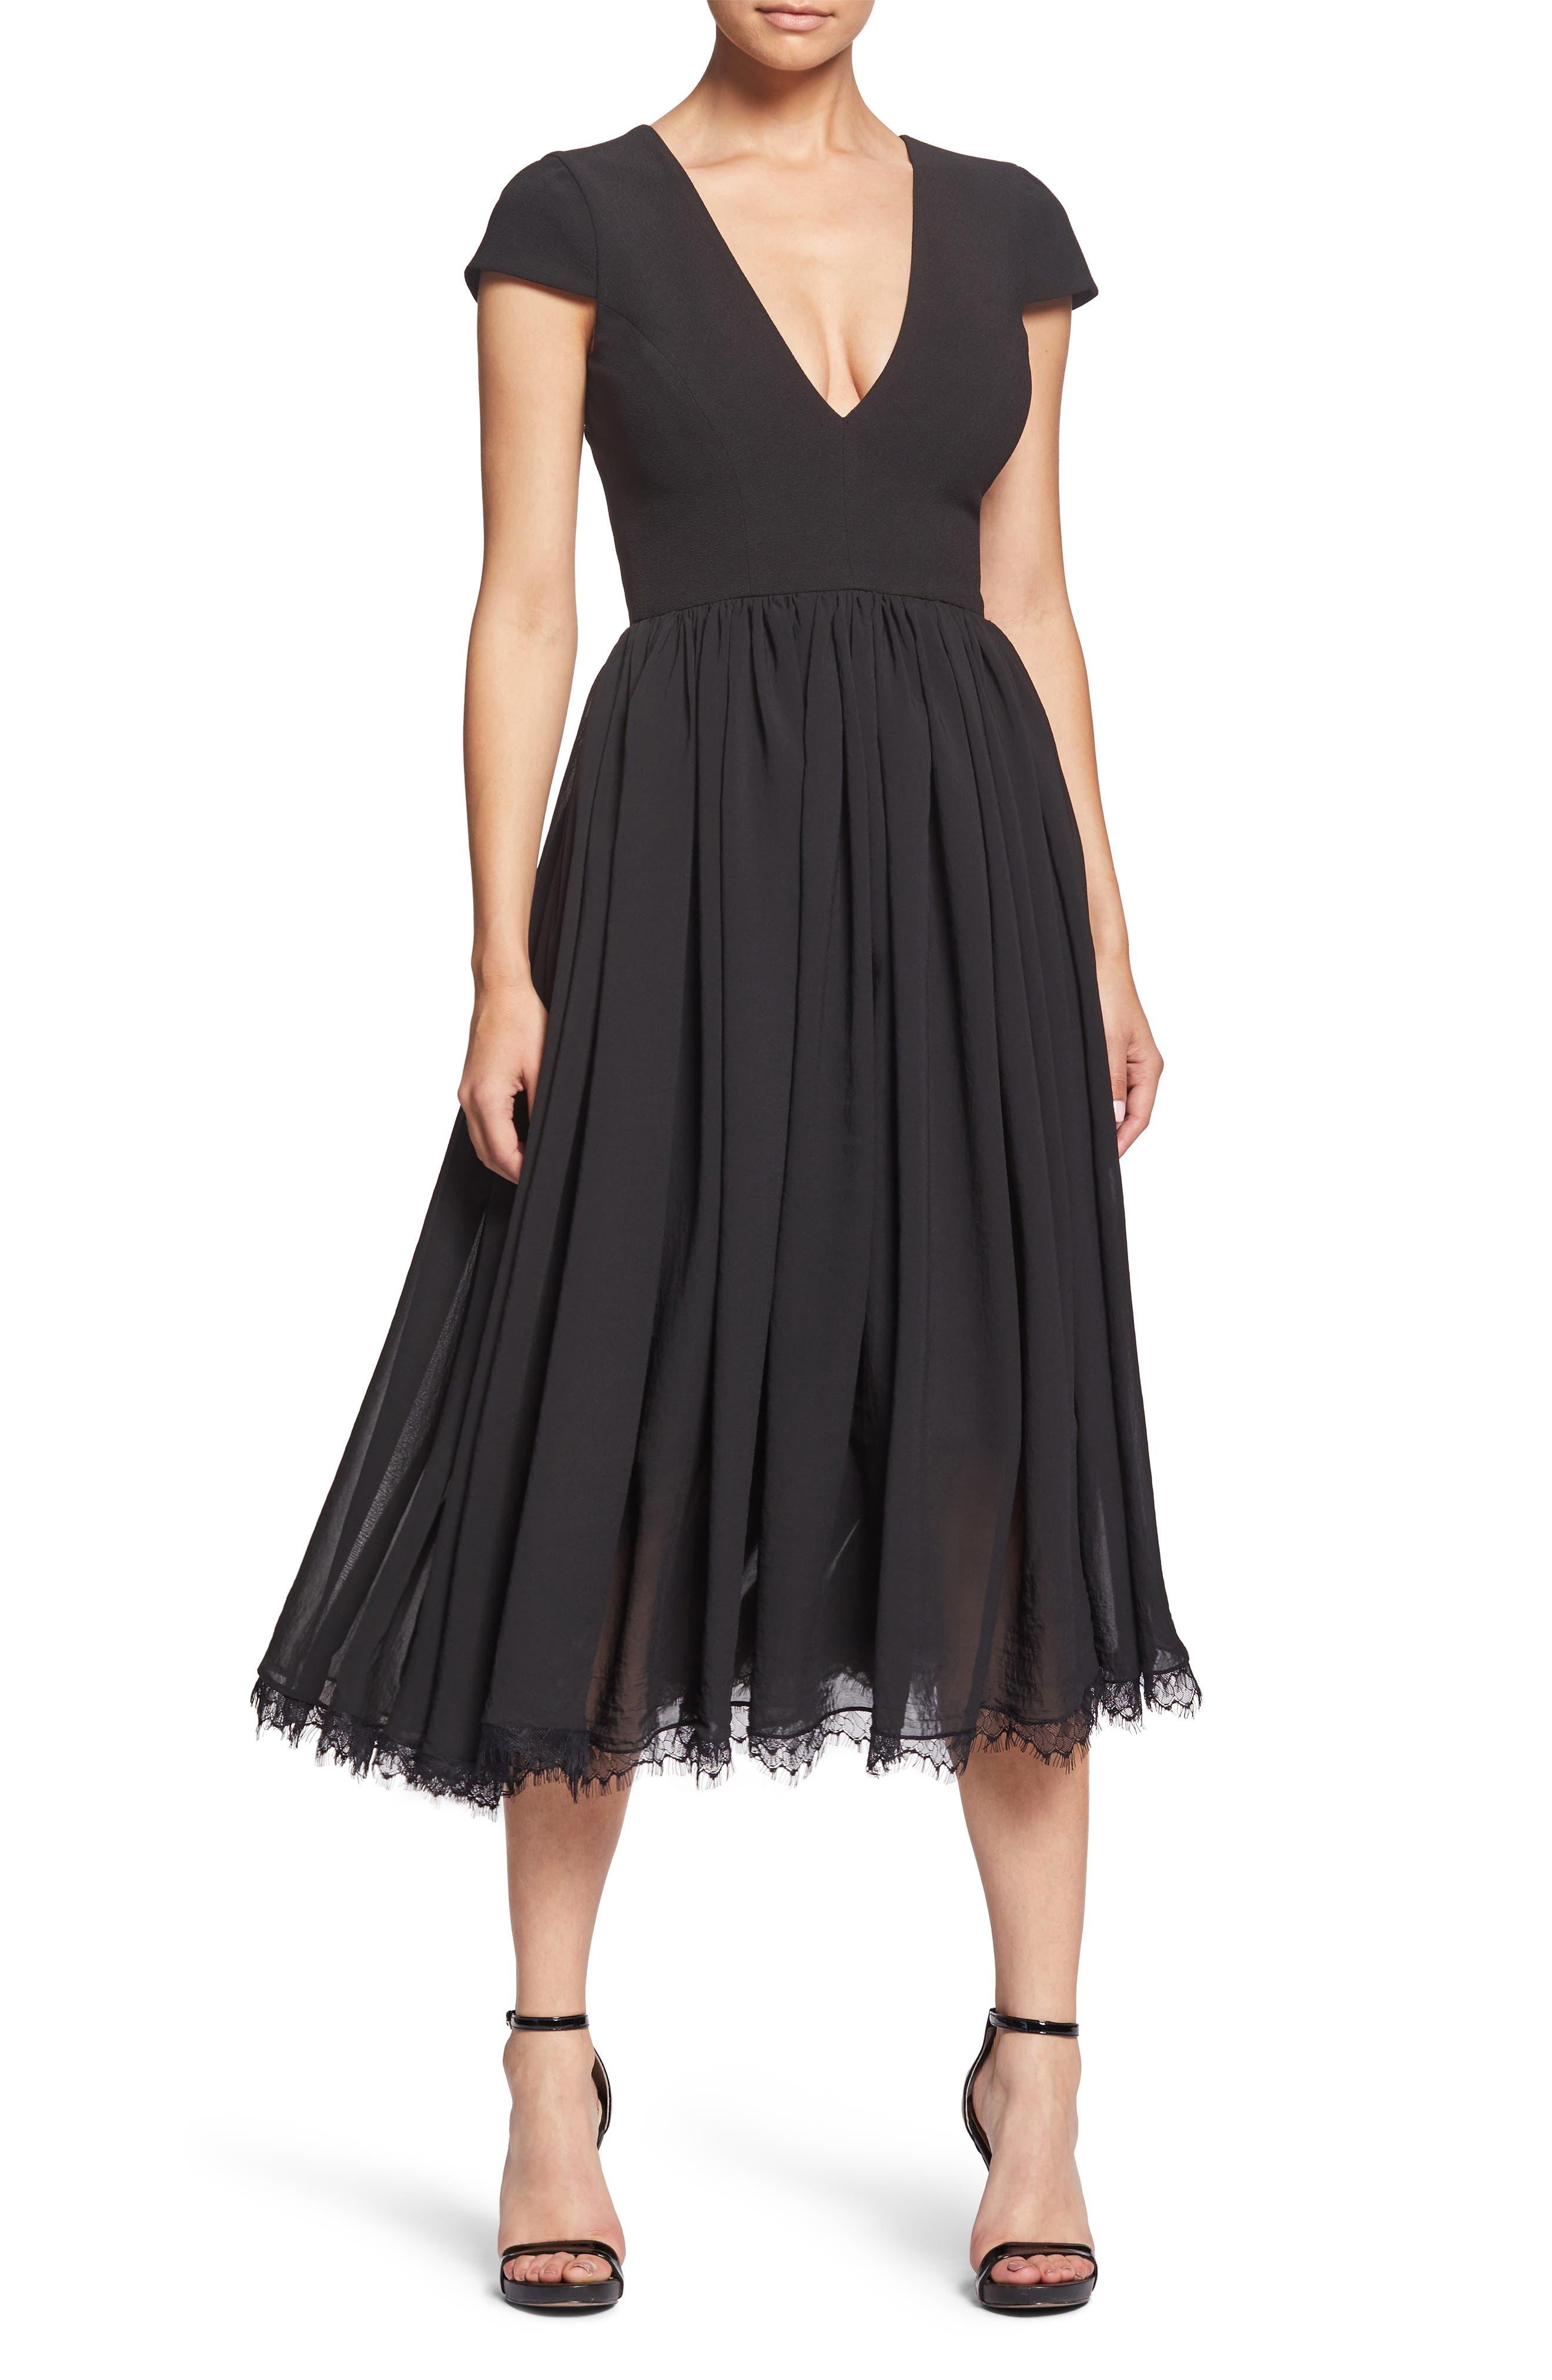 DRESS THE POPULATION, Corey Chiffon Fit & Flare Dress, Alternate thumbnail 6, color, BLACK